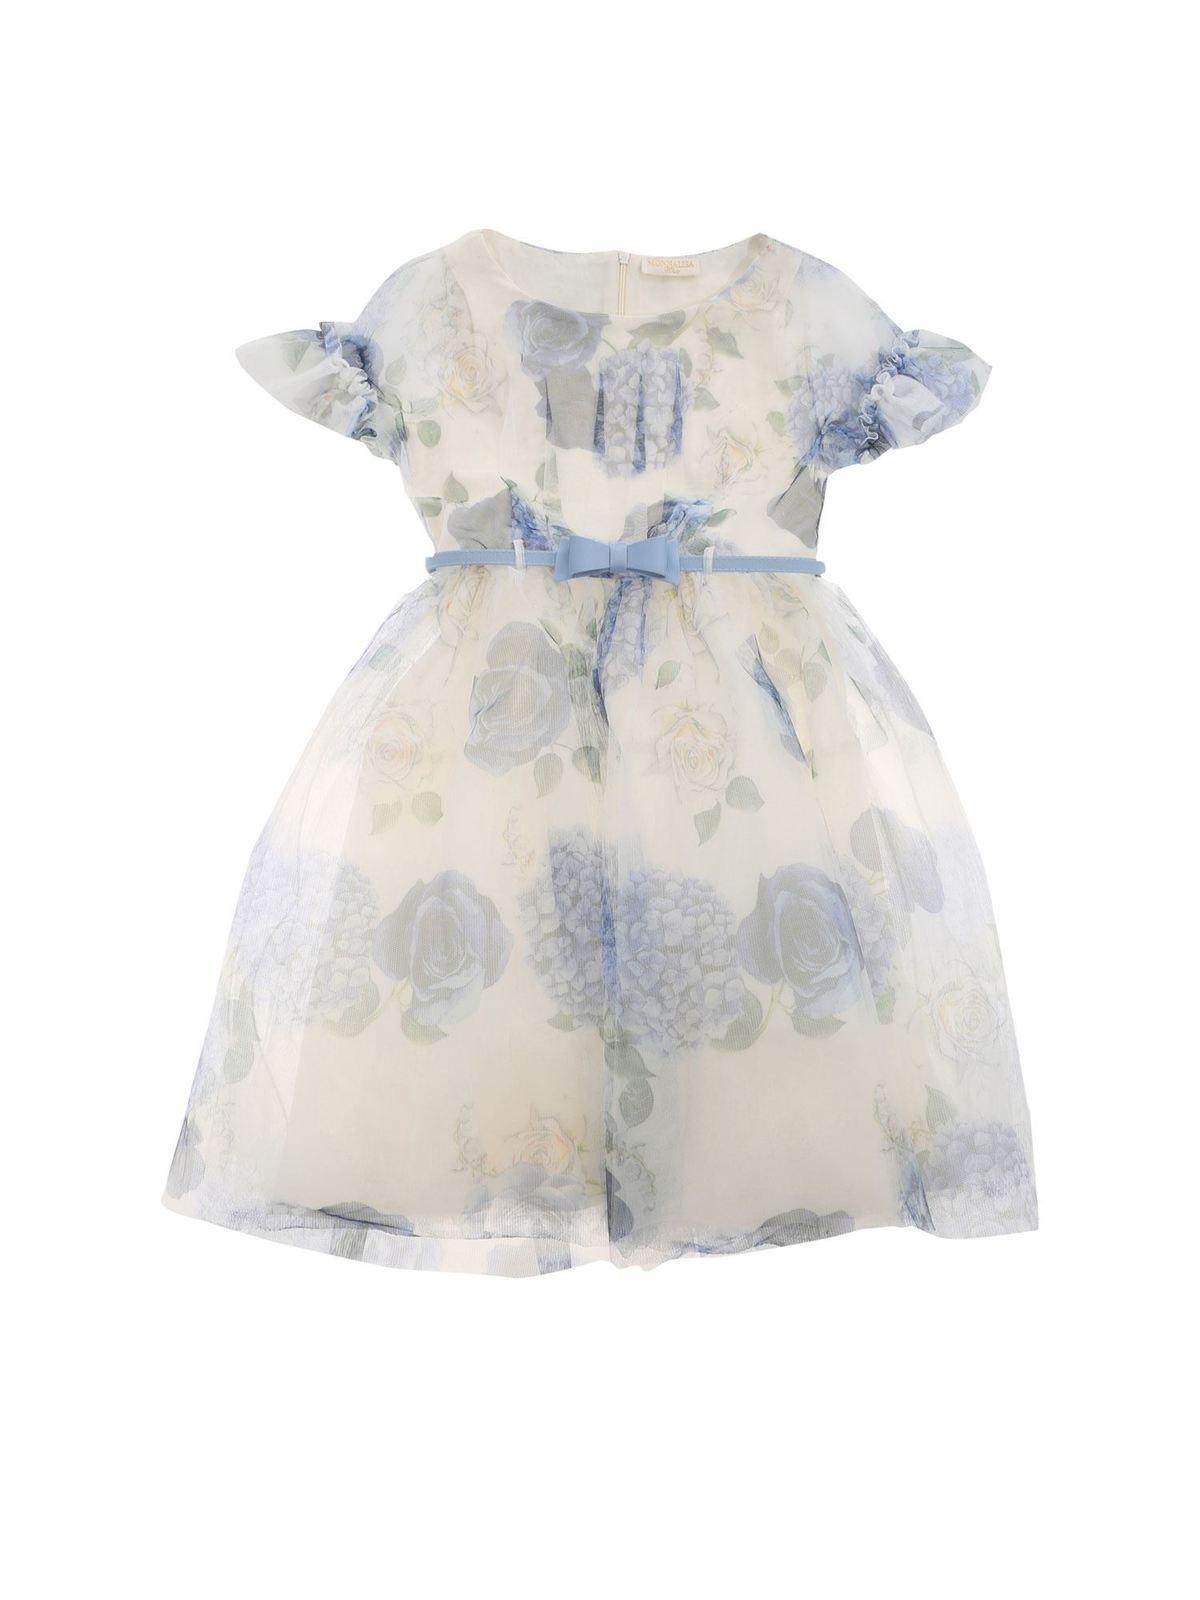 Monnalisa ROMANTIC GARDEN DRESS IN WHITE